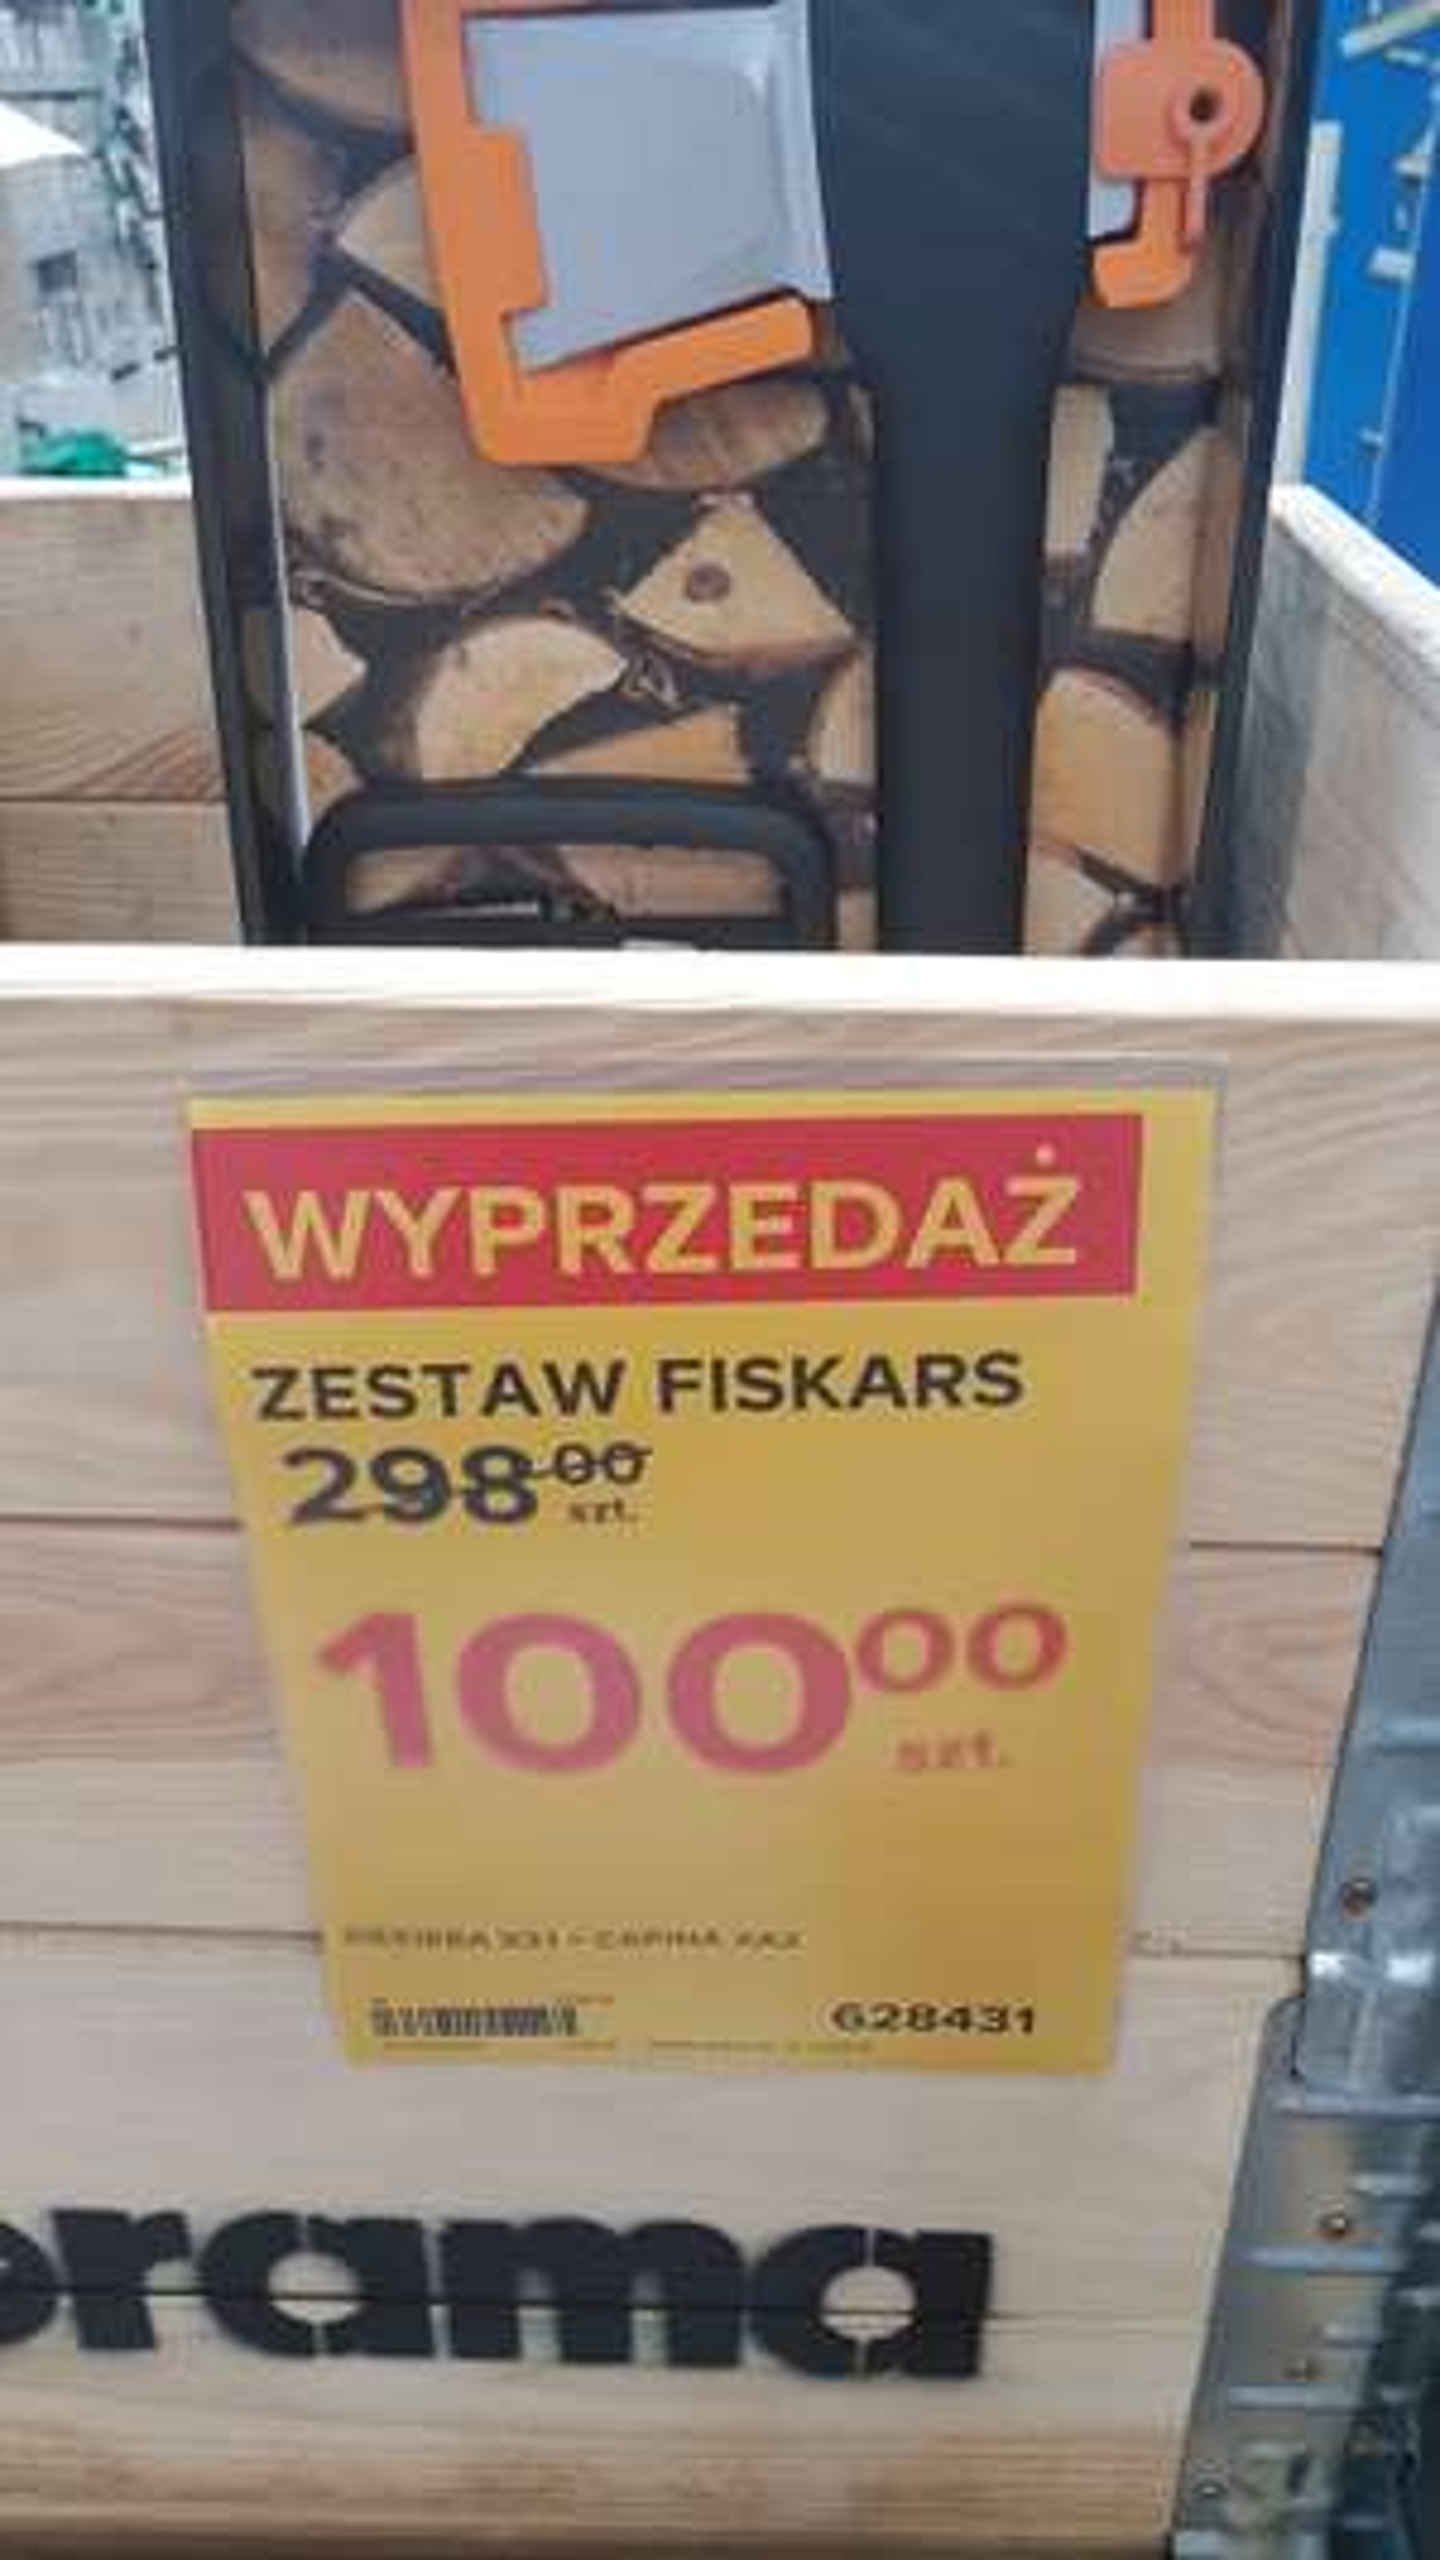 ZESTAW FISKARS SIEKIERA X21 + CAPINA Xa2 Castorama